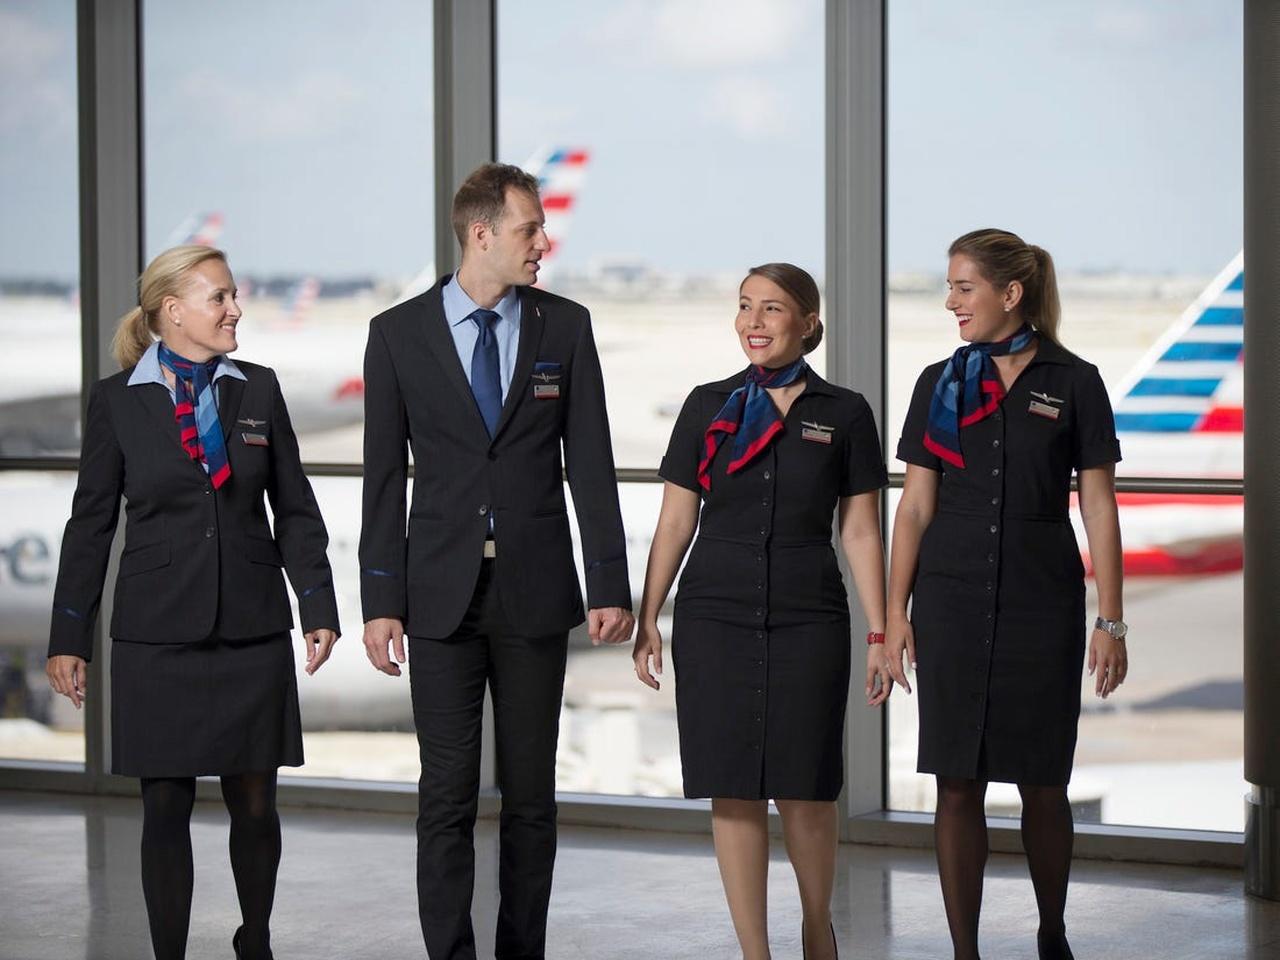 اَمِریکَن ایرلاینز (American Airlines)، آمریکا